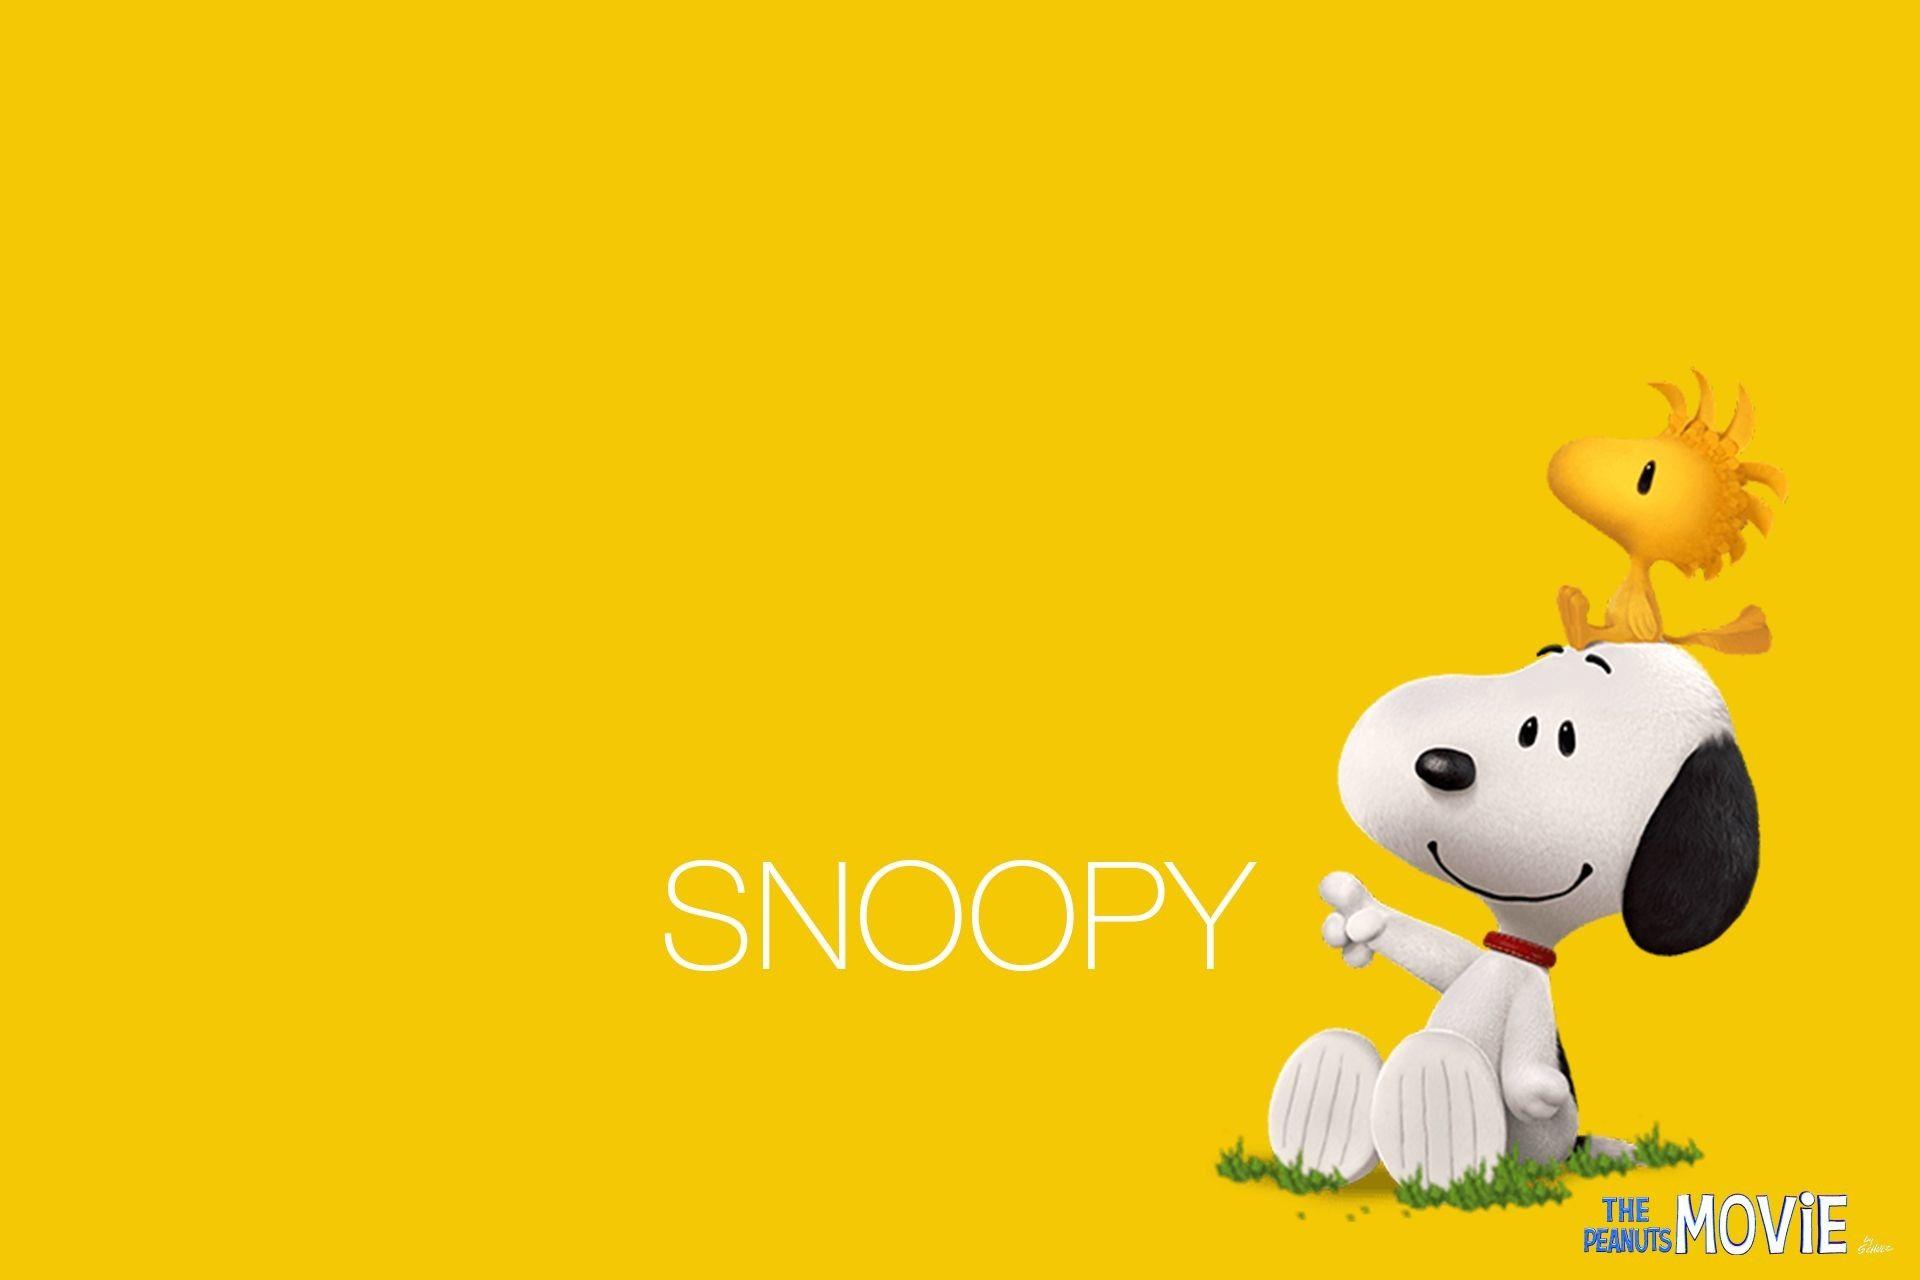 Gambar Snoopy Hd Dari Berbagai Gambar Snoopy Lucu Dan Bikin Seru Di 2020 Snoopy Charlie Brown Gambar Lucu